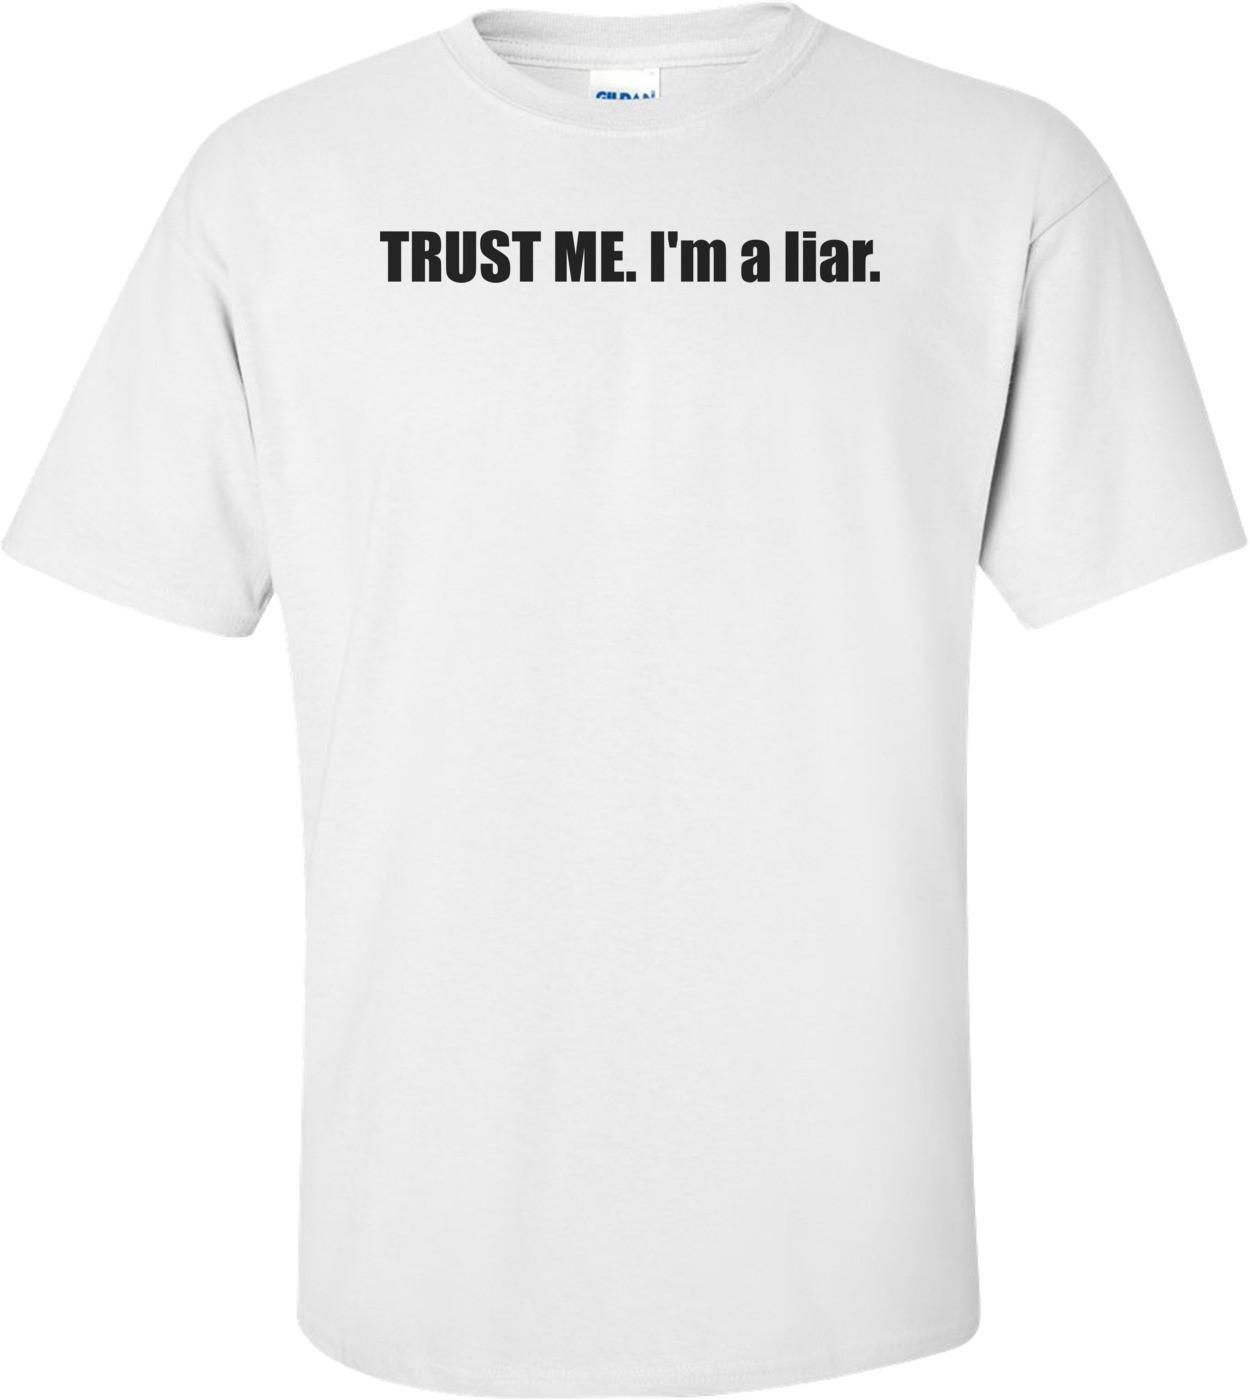 TRUST ME. I'm a liar. Shirt